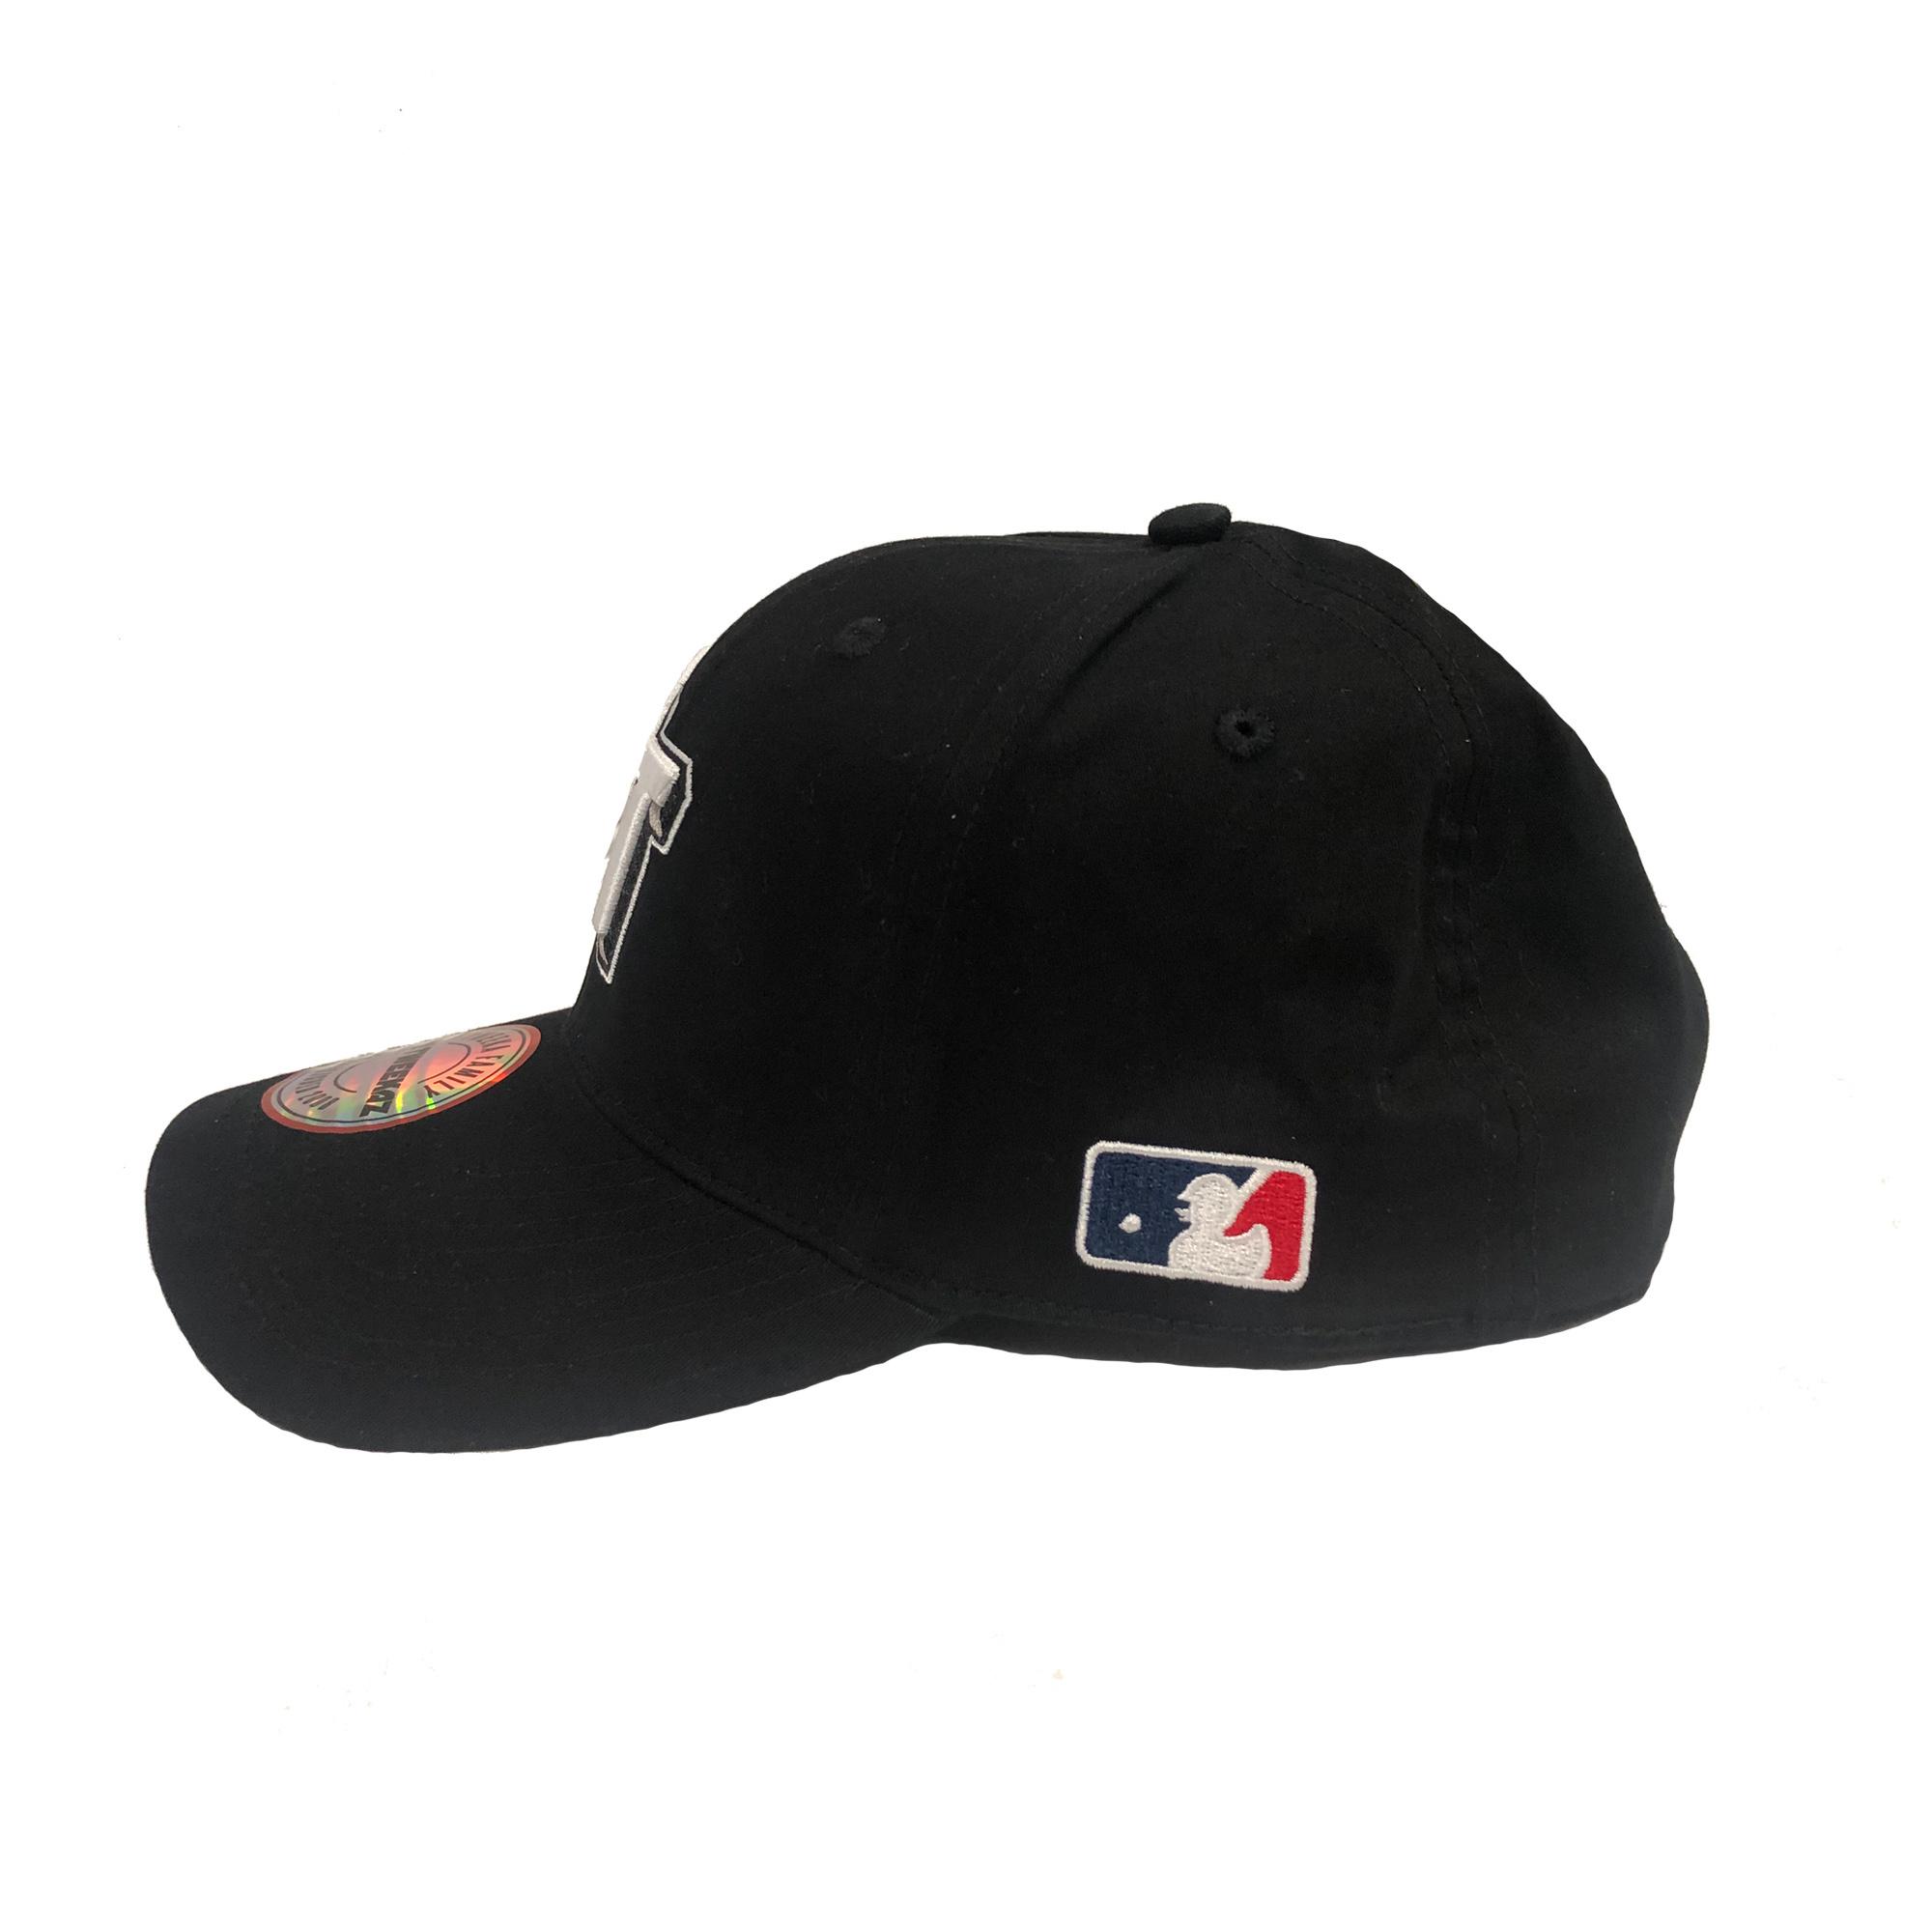 DT Baseball Cap